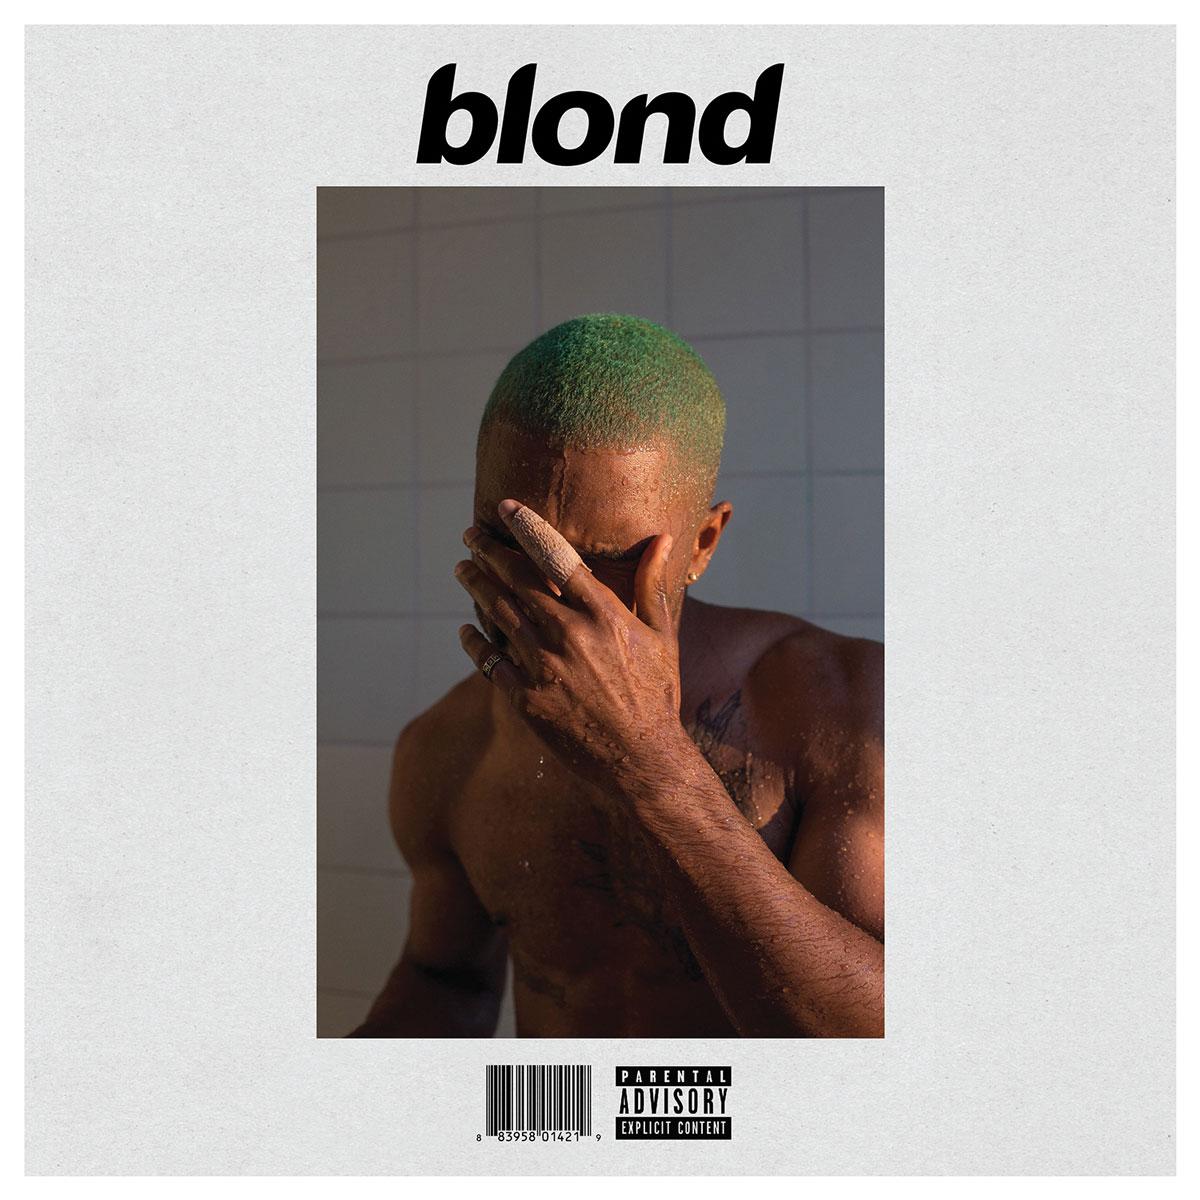 blondcover-final